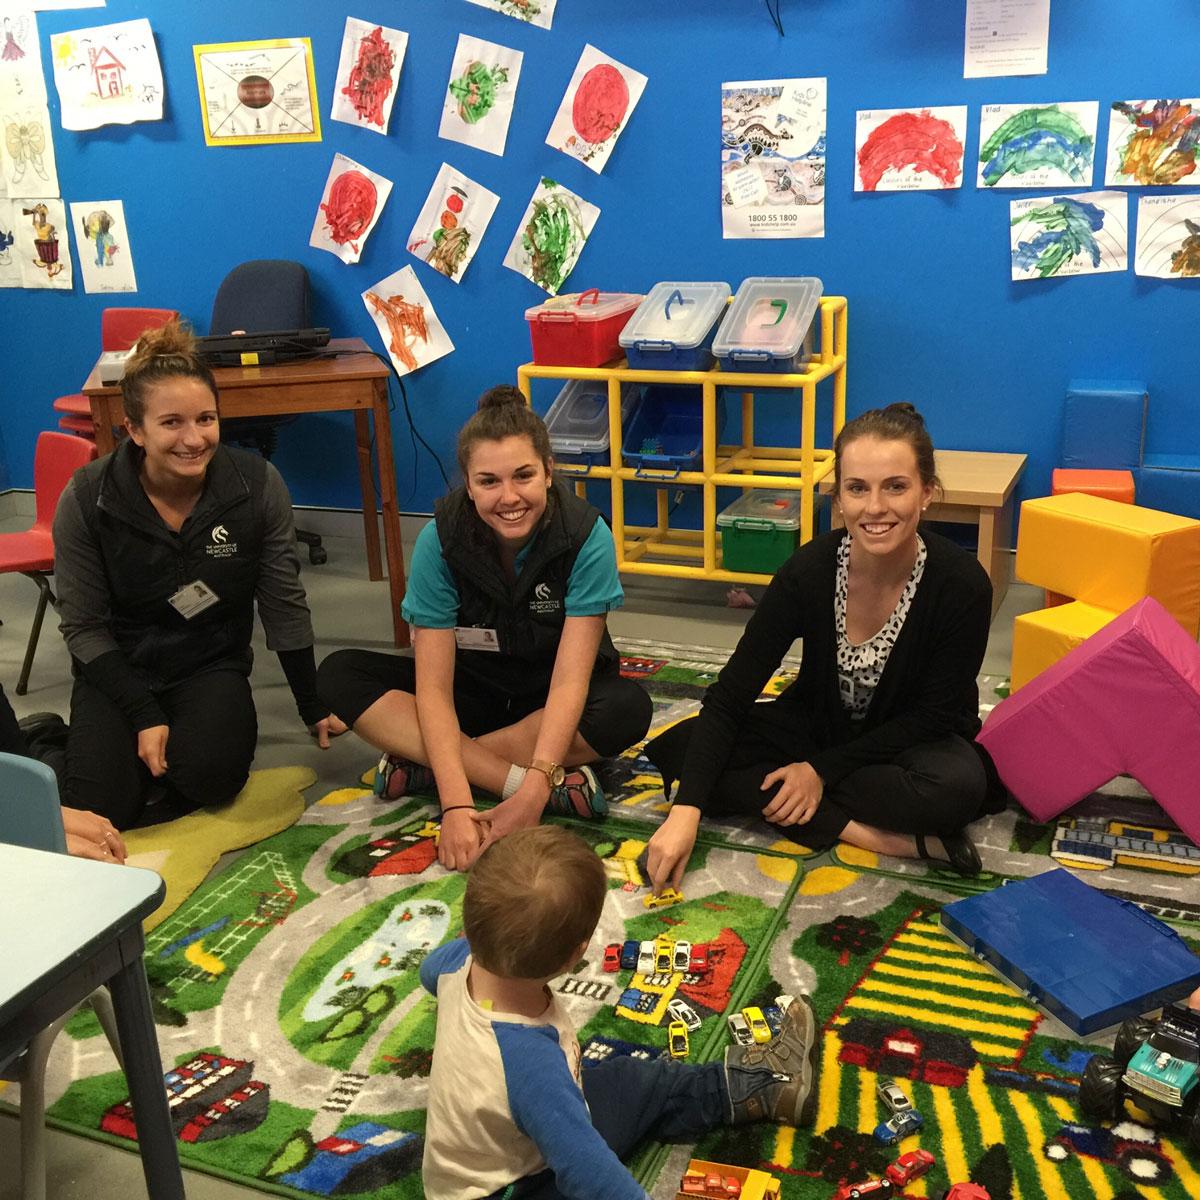 Early Development Education Programs